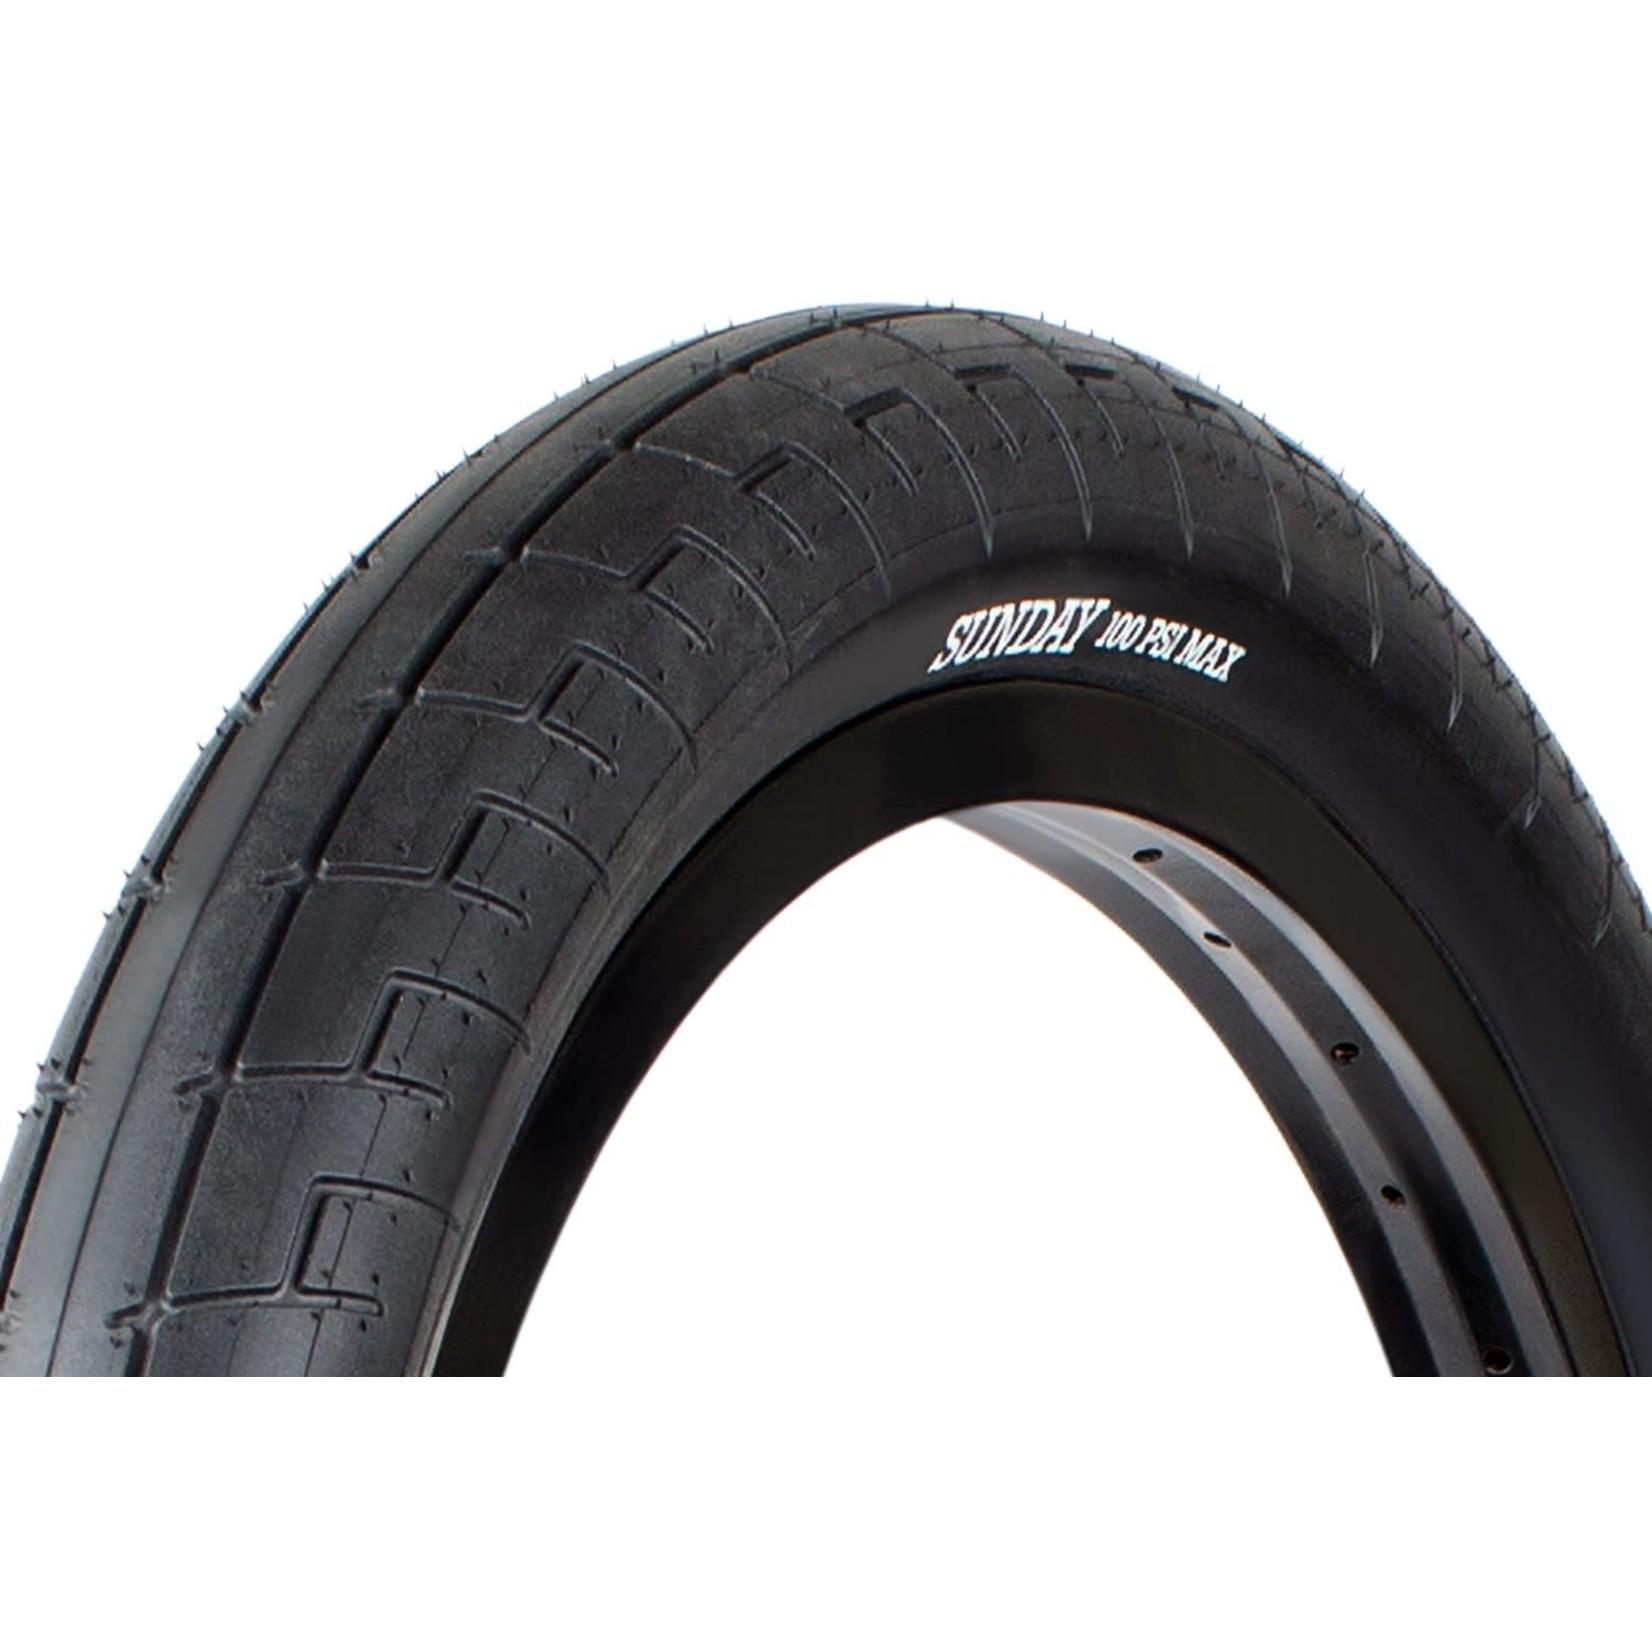 Sunday Sunday Street Sweeper Tire - 20 x 2.4